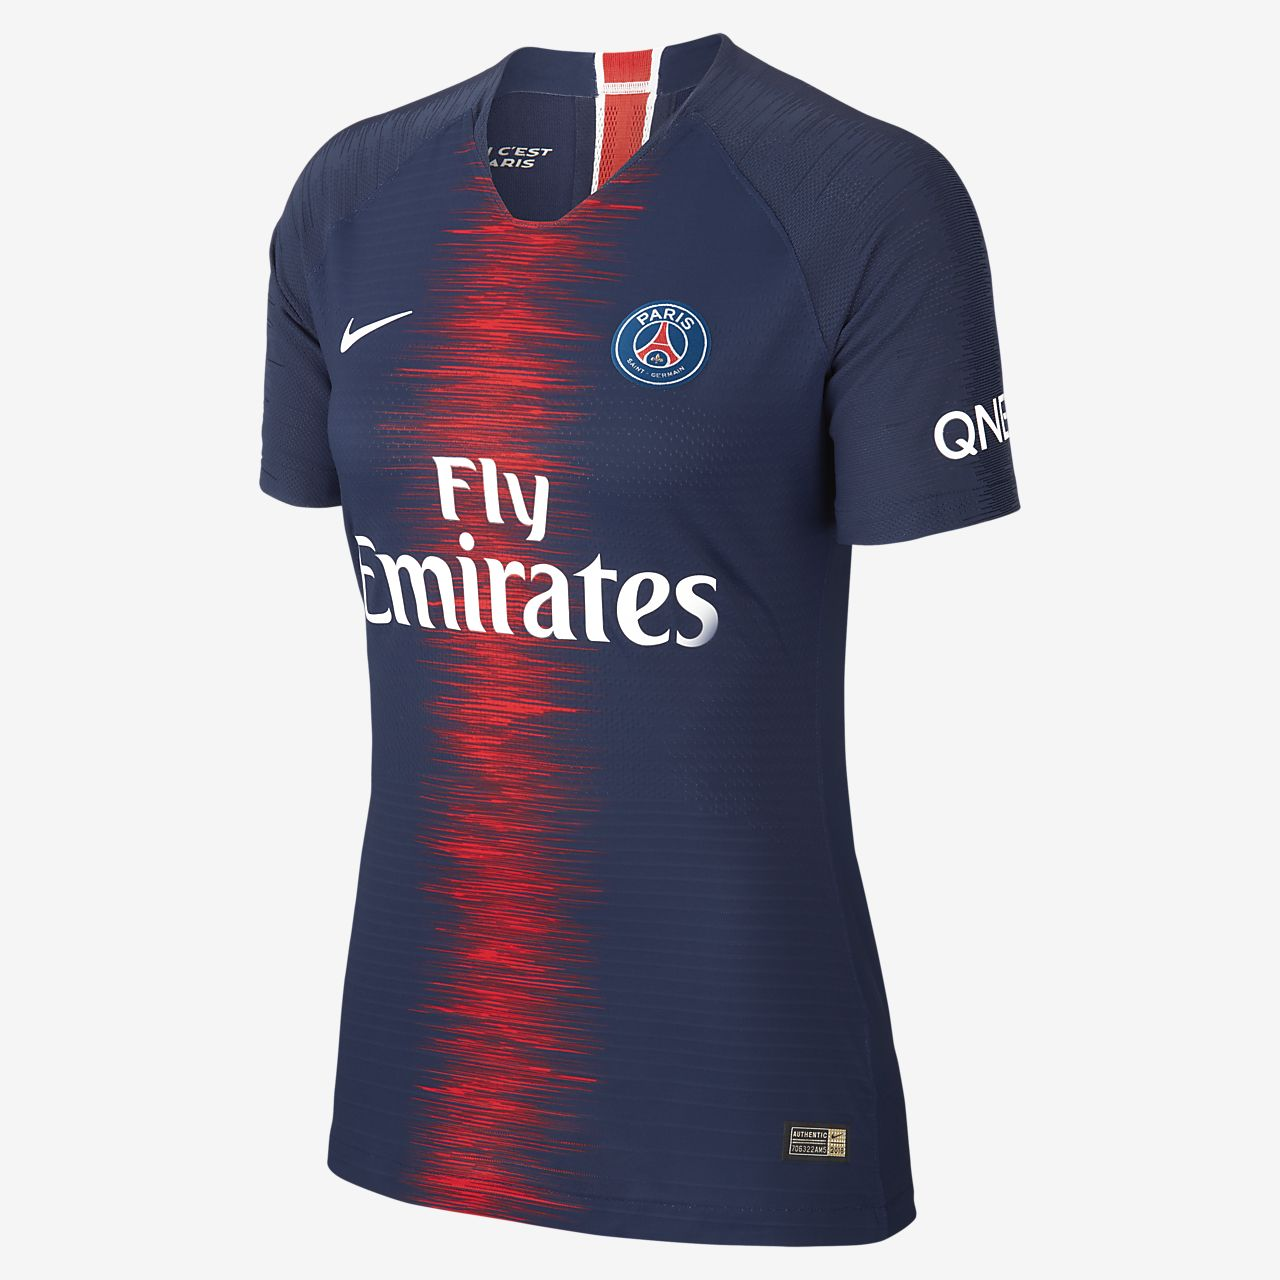 dc75200fa746a ... Camiseta de fútbol para mujer de local Vapor Match del Paris Saint- Germain 2018